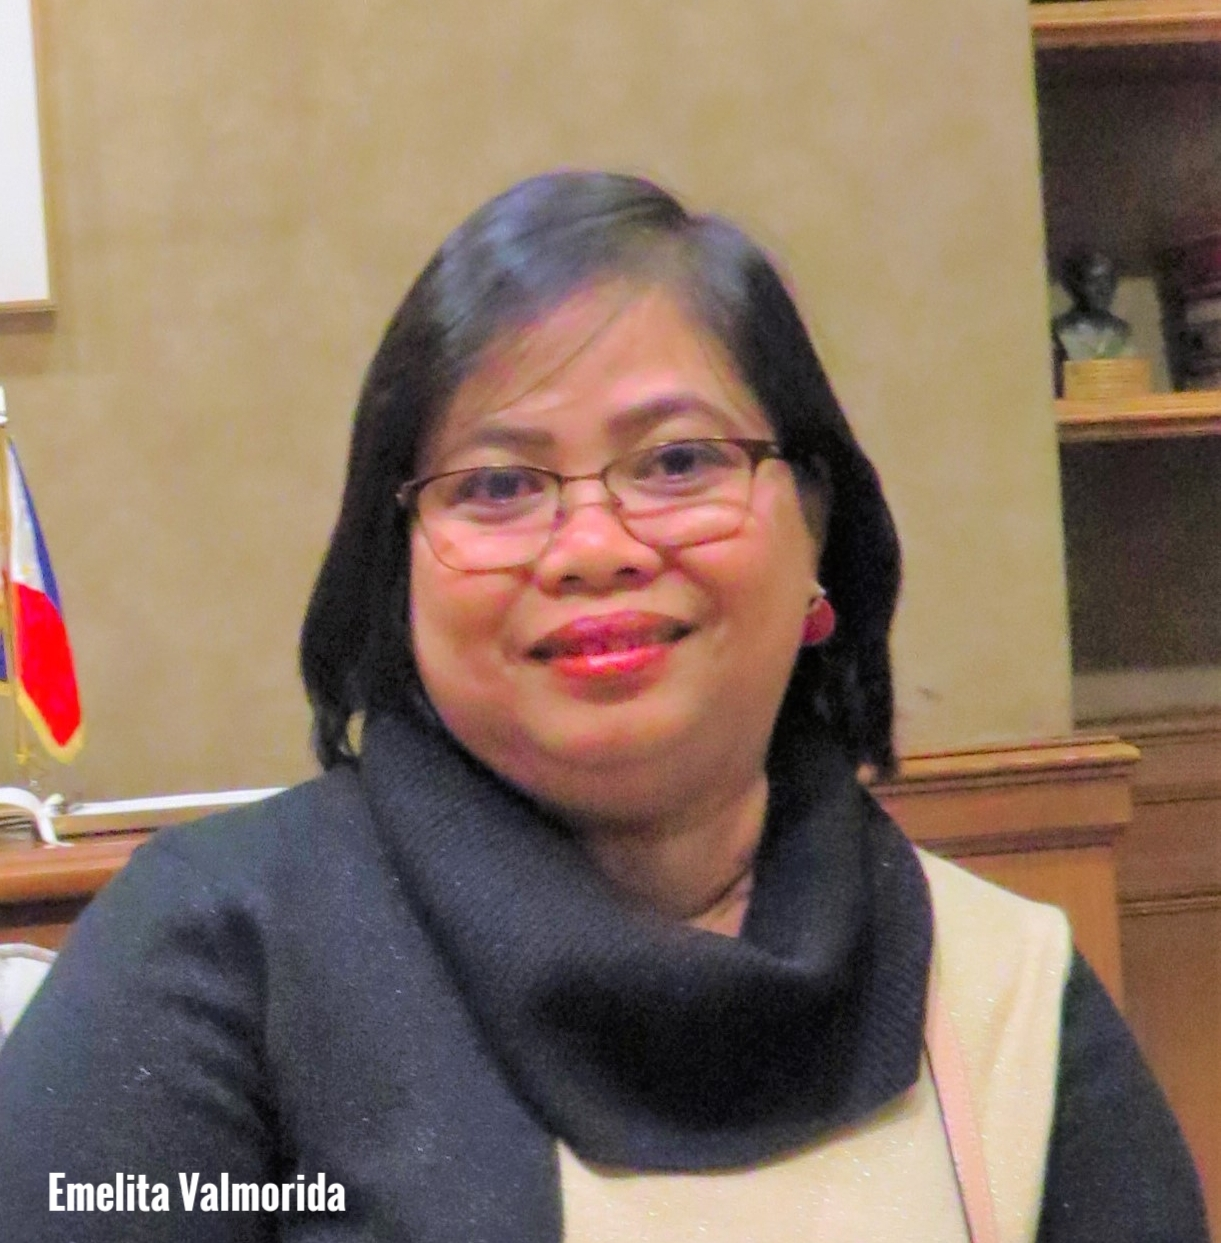 Emelita Valmorida is a poet, art therapist, and accountant